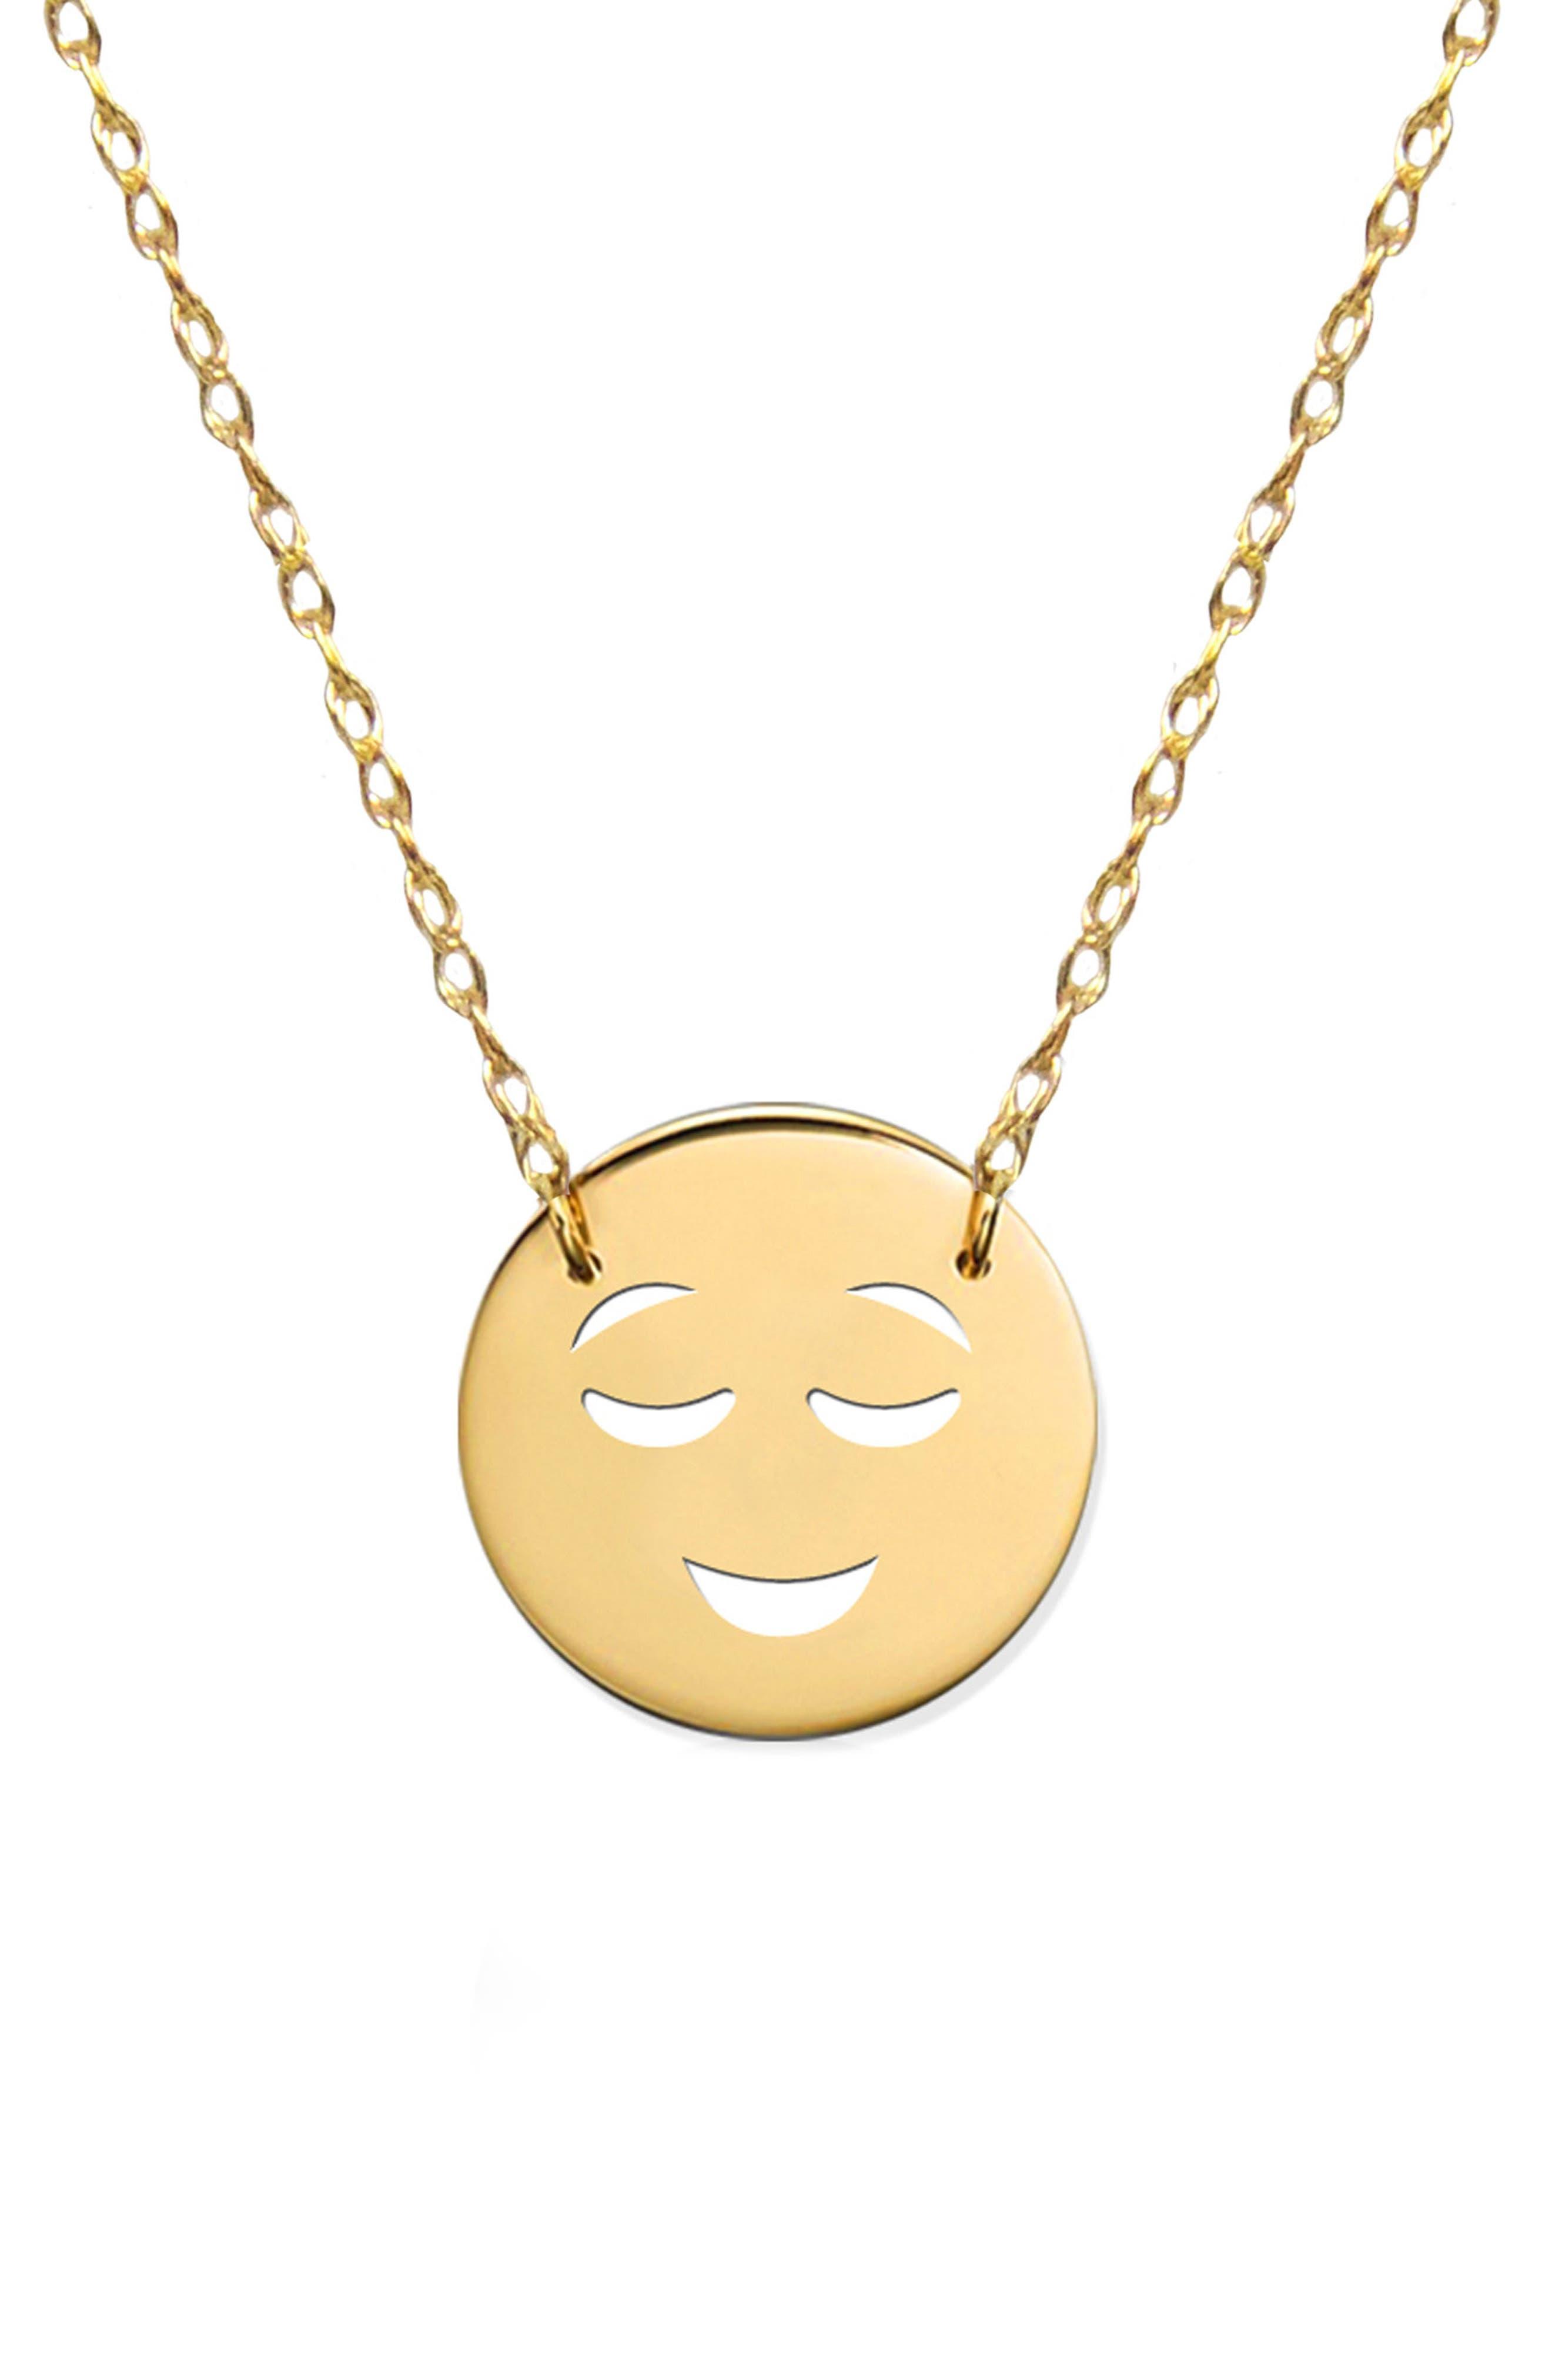 JANE BASCH DESIGNS Happy Emoji Pendant Necklace